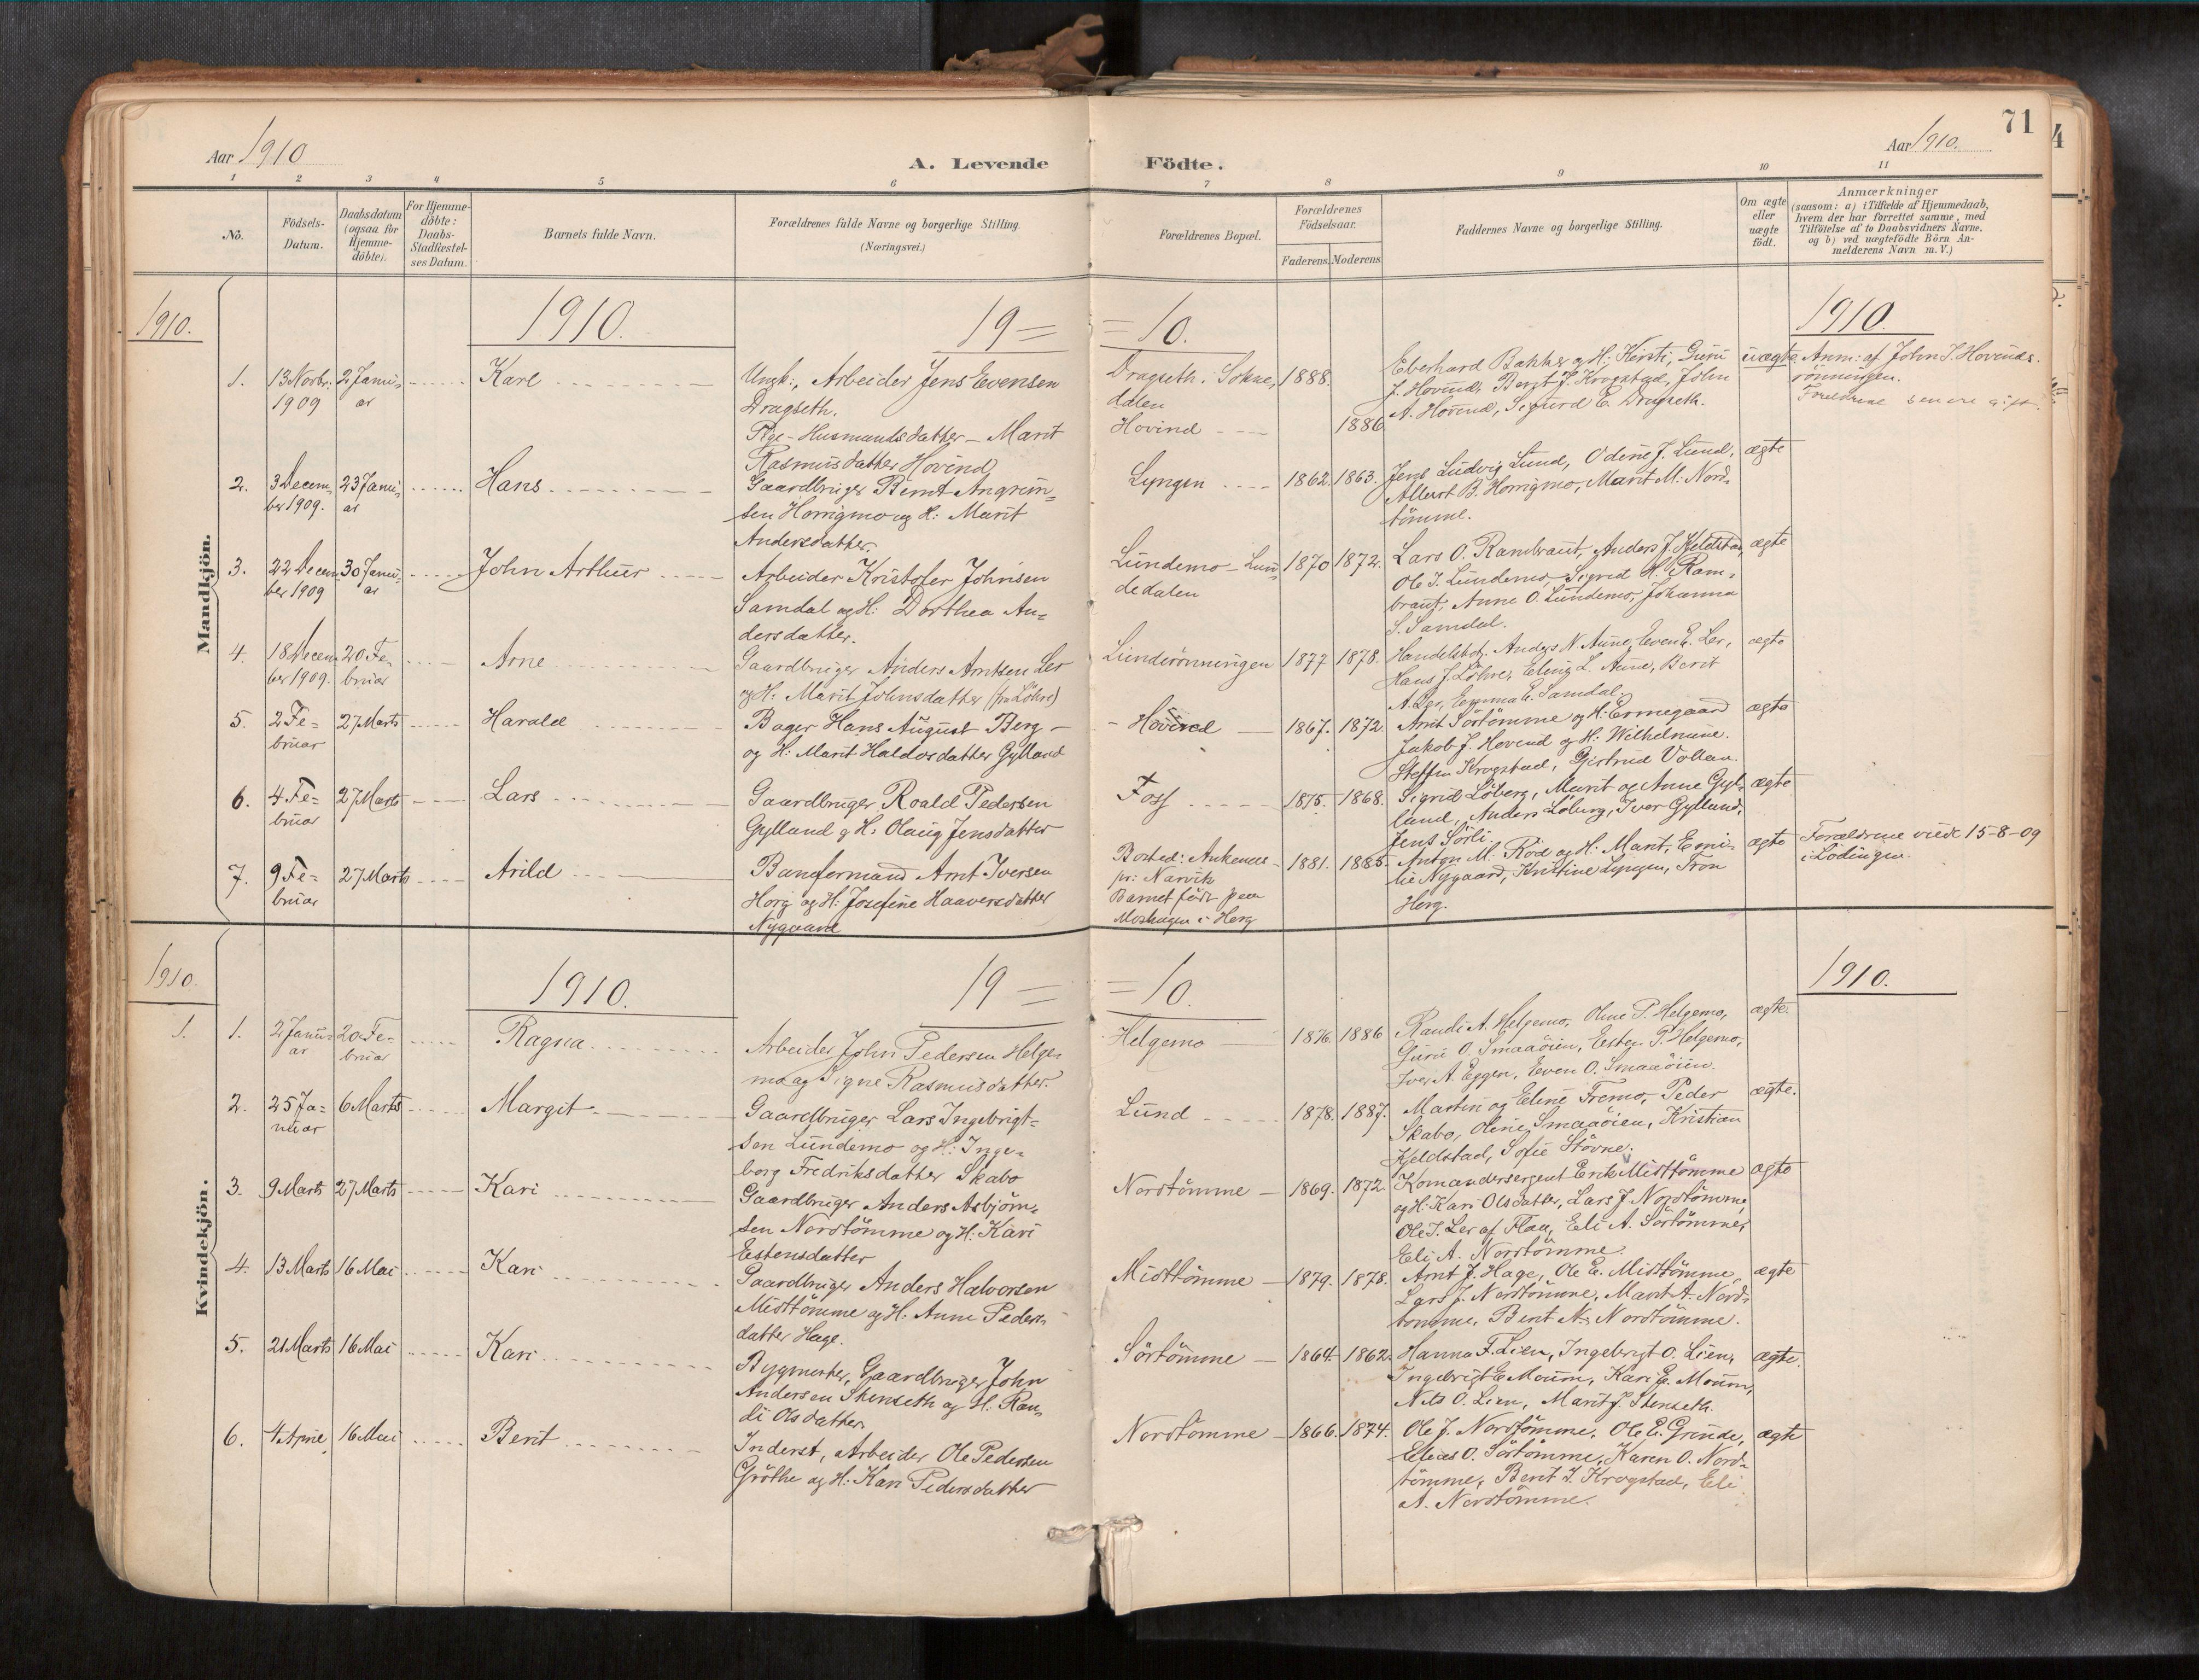 SAT, Ministerialprotokoller, klokkerbøker og fødselsregistre - Sør-Trøndelag, 692/L1105b: Parish register (official) no. 692A06, 1891-1934, p. 71